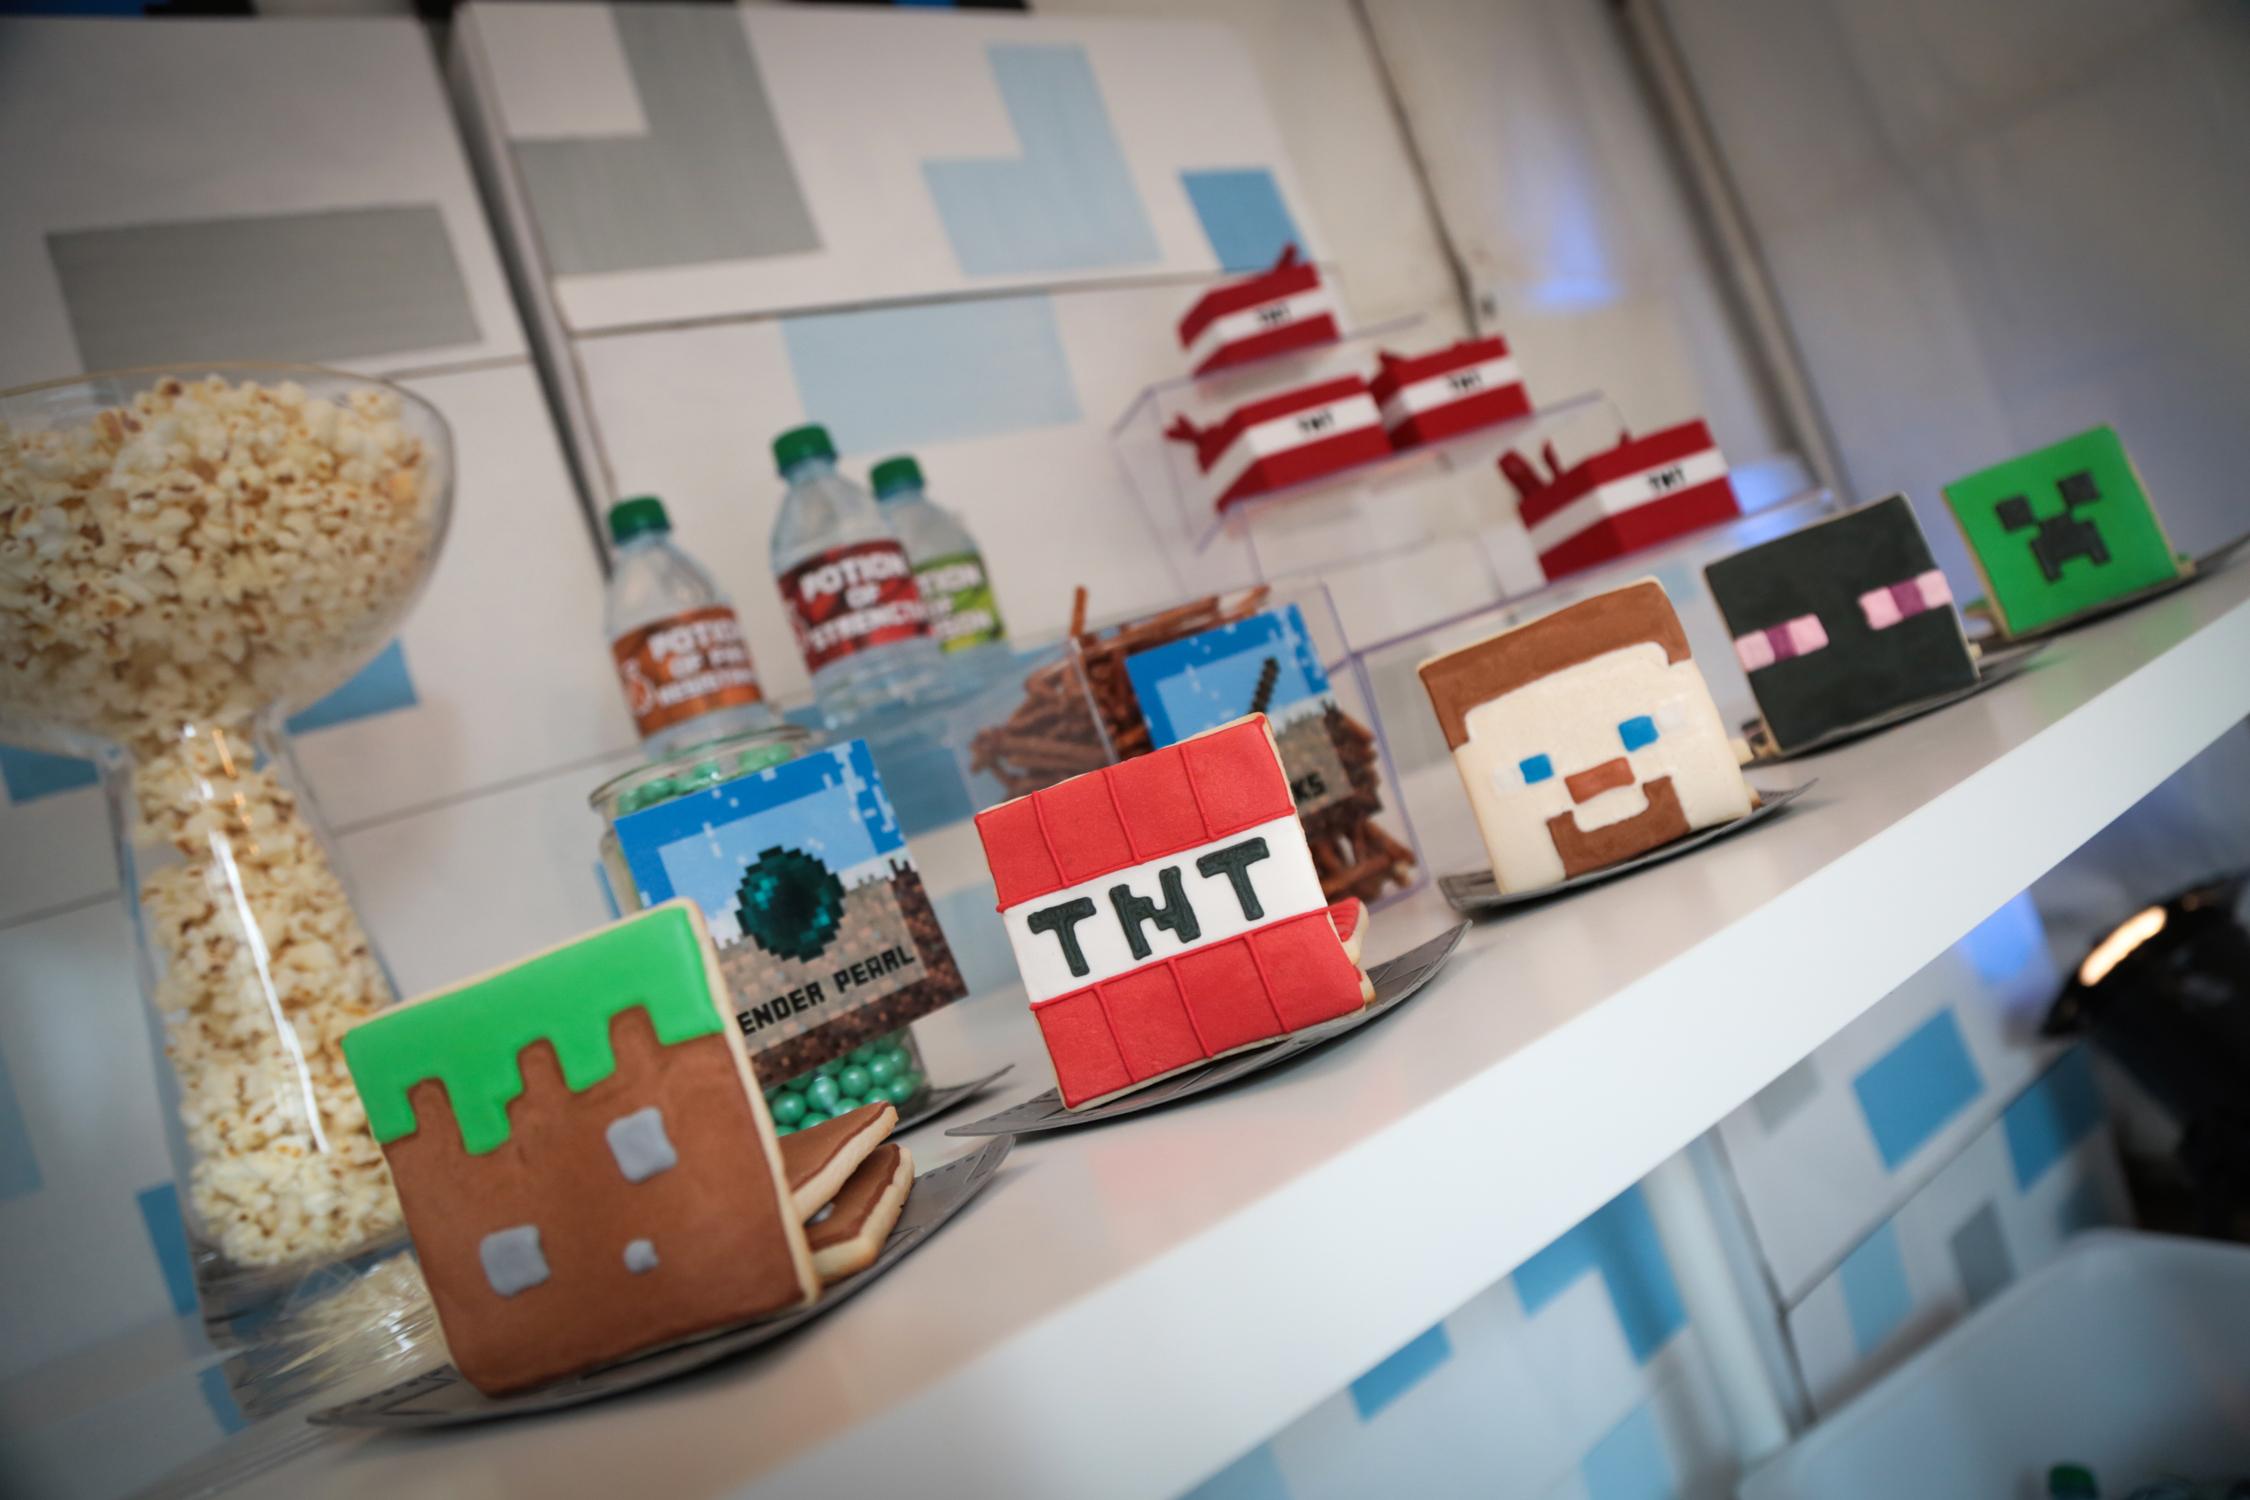 tarynco-events-minecraft-kids-birthday-party-snackbar (4).jpg